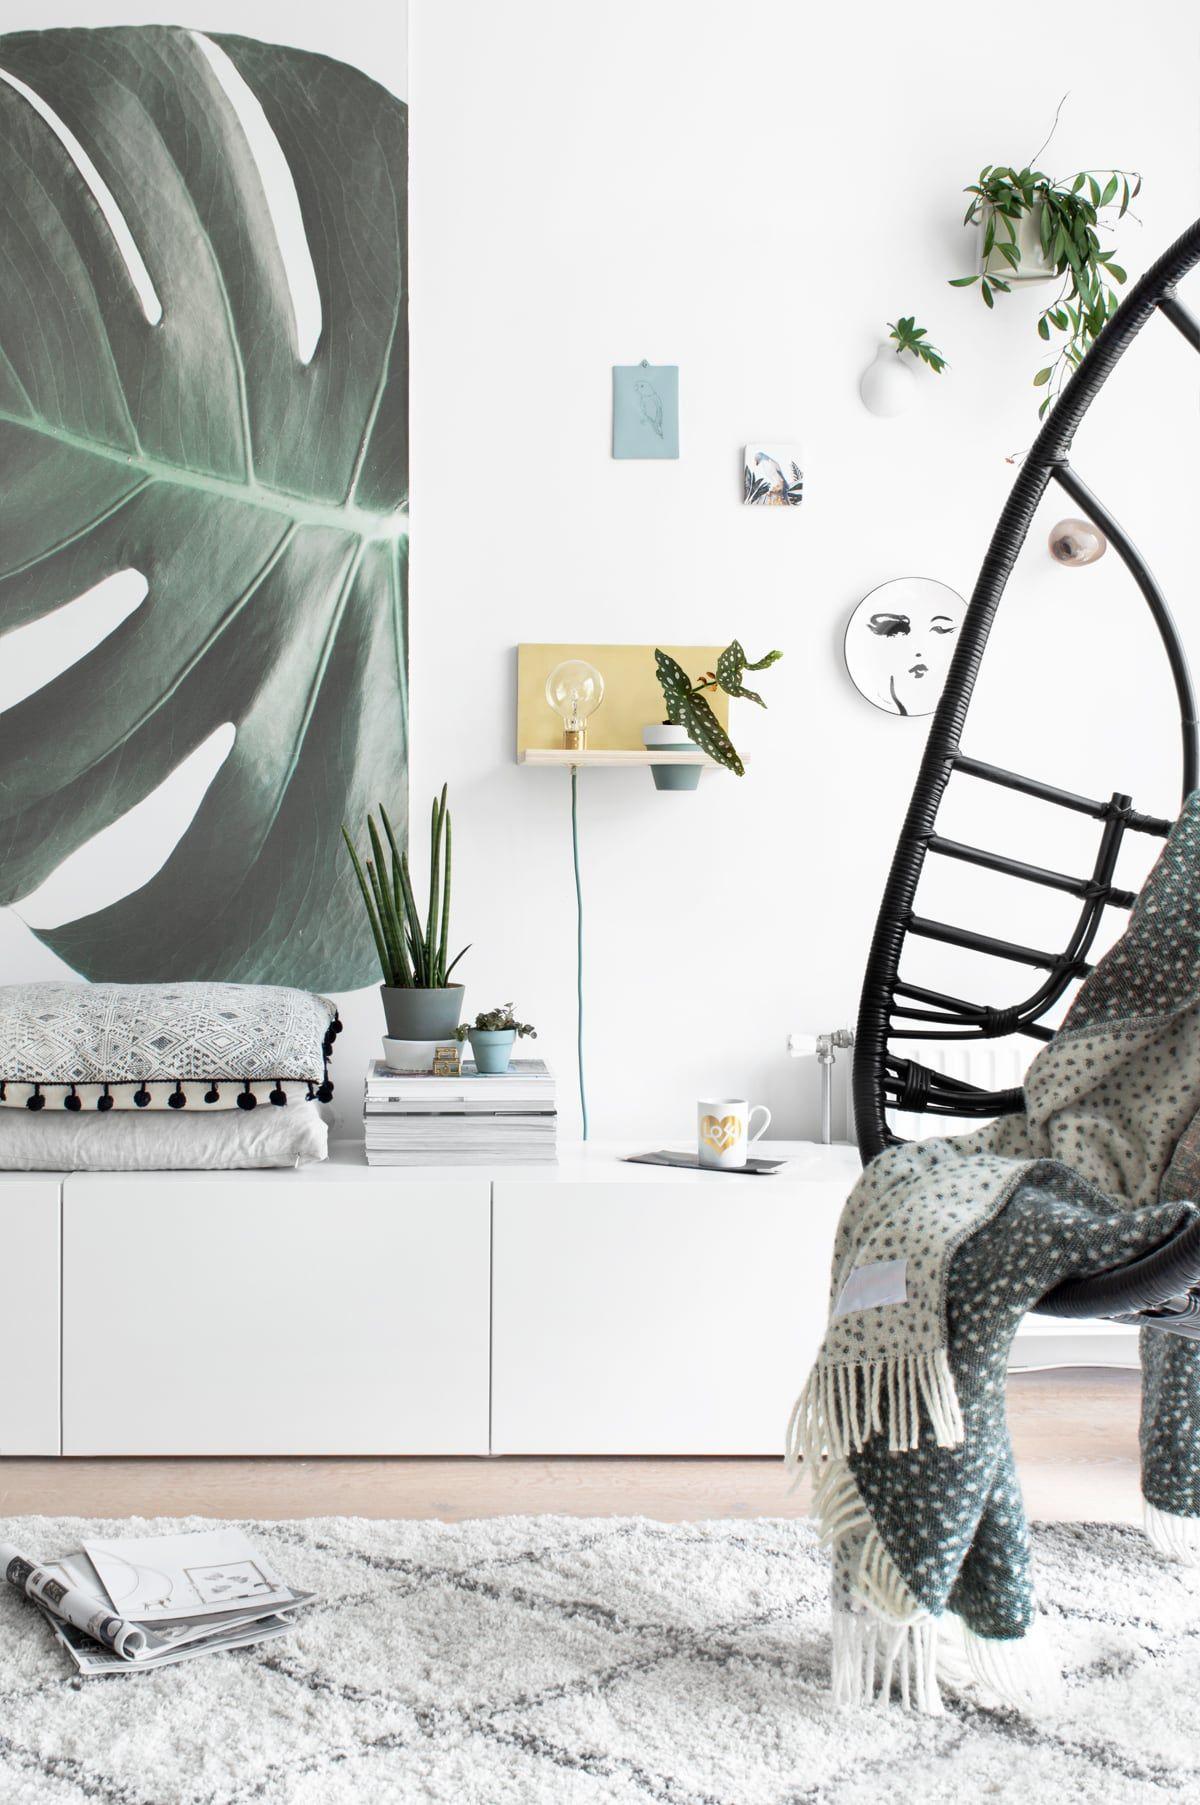 Wandplank Met Lamp.Diy Maak Je Eigen Zwevende Wandplank Met Lamp En Plantje Kussen